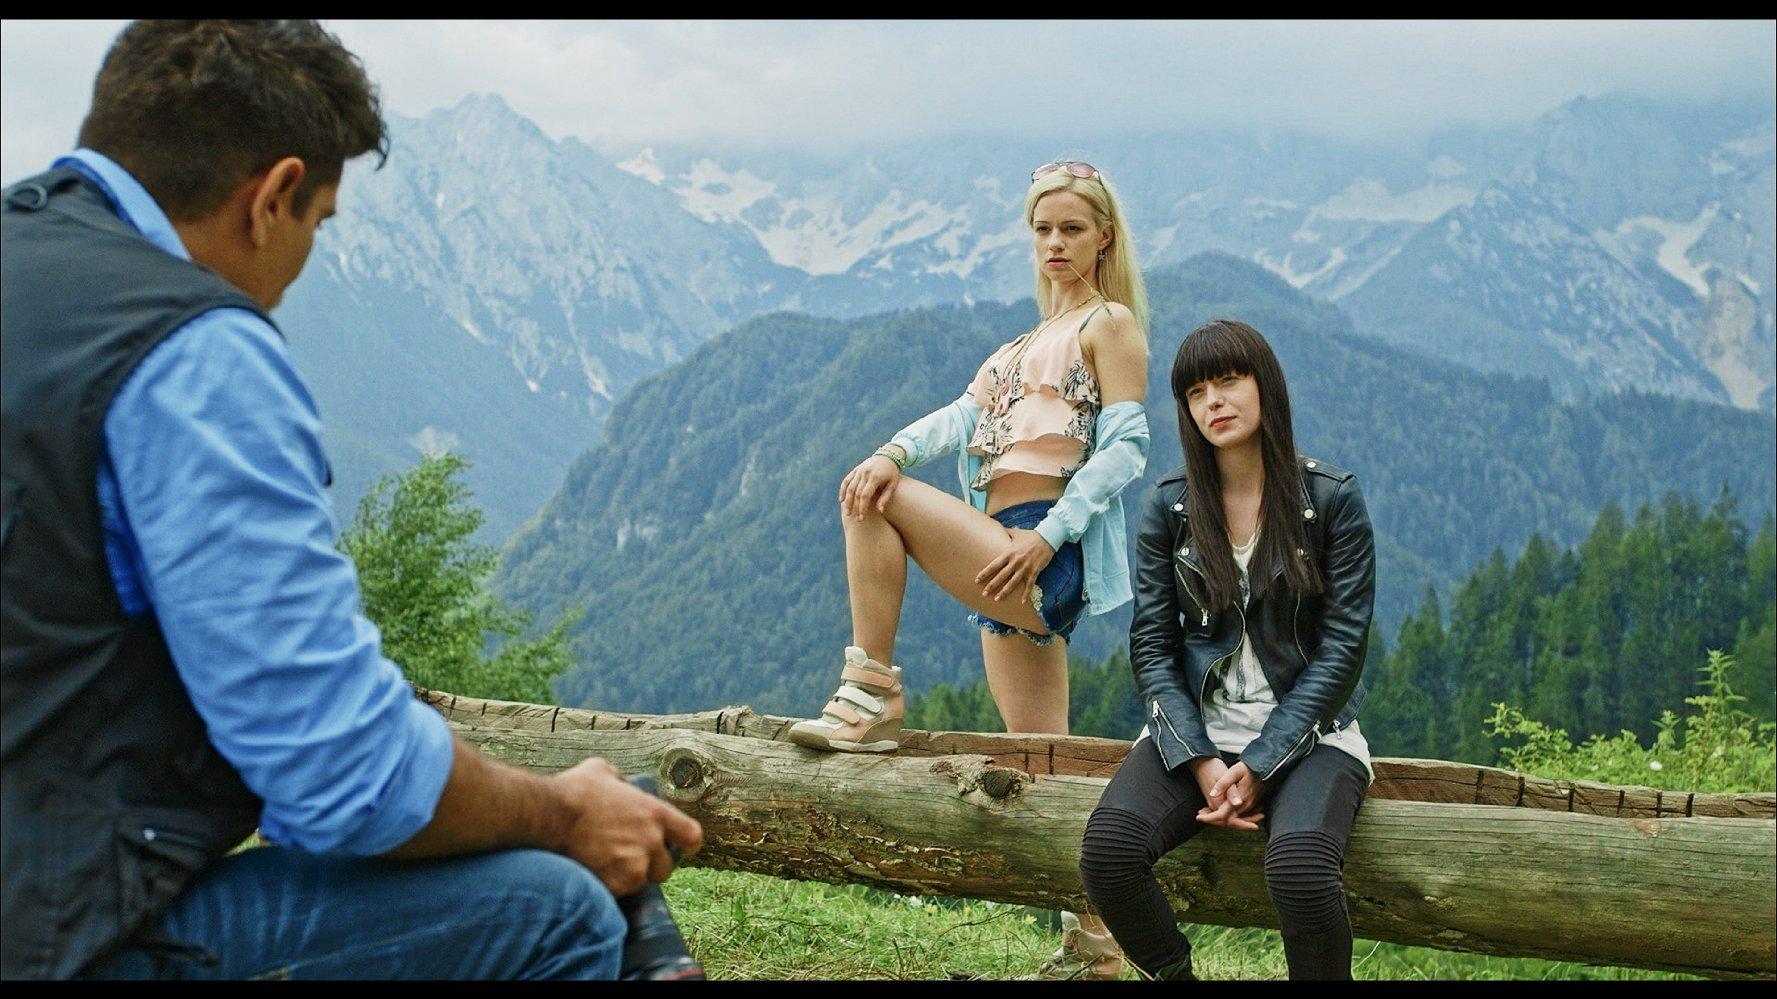 Slovenia: Land of natural beauty and bored models.